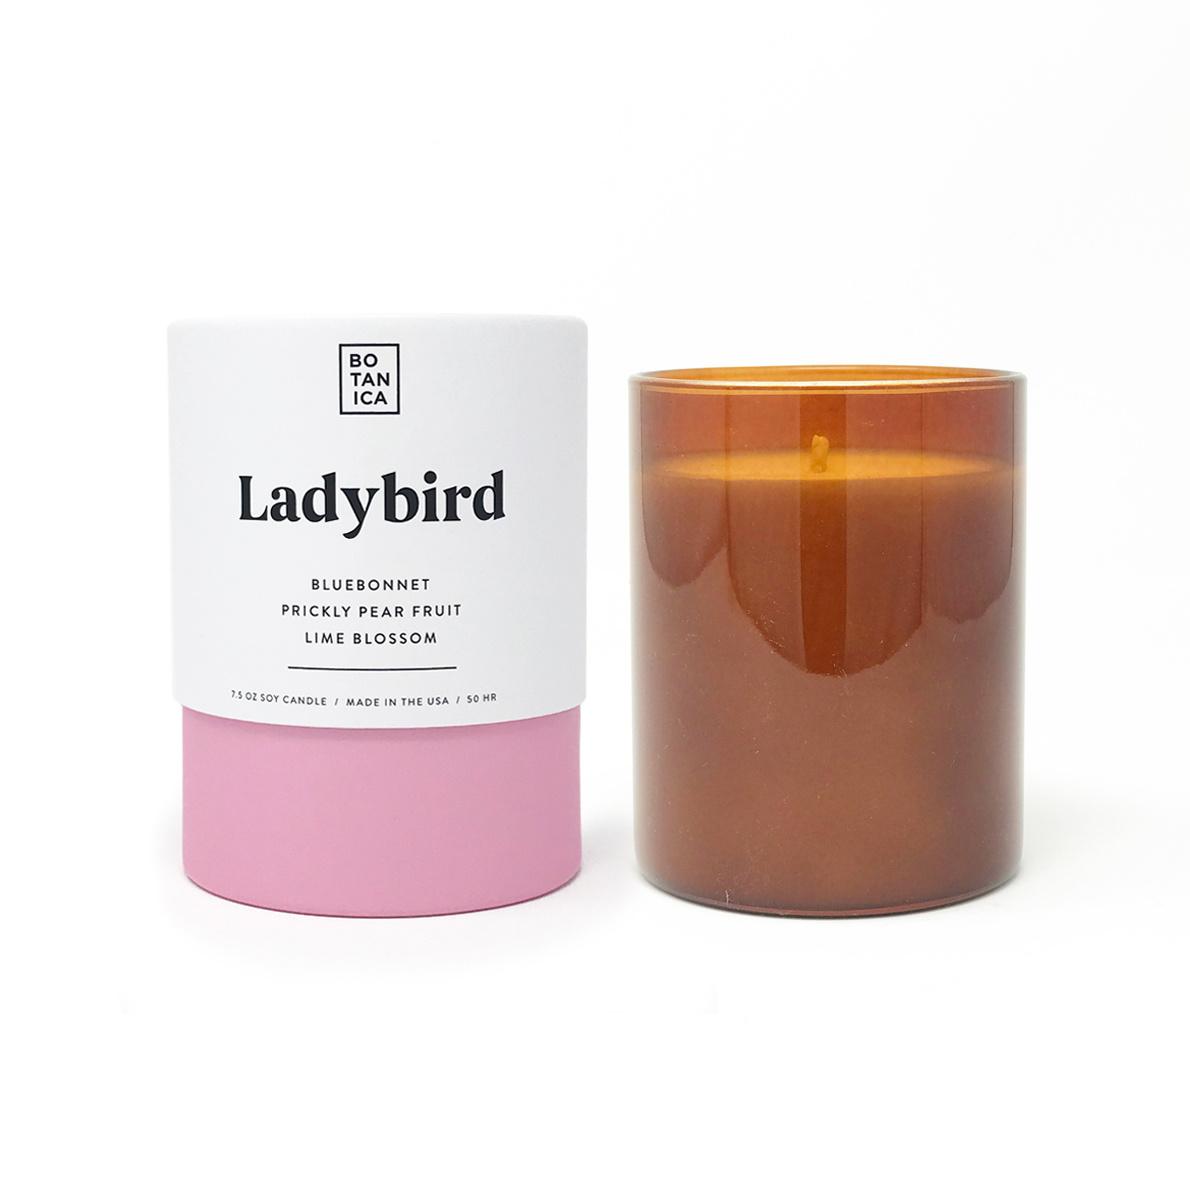 Botanica - BOT Ladybird Candle